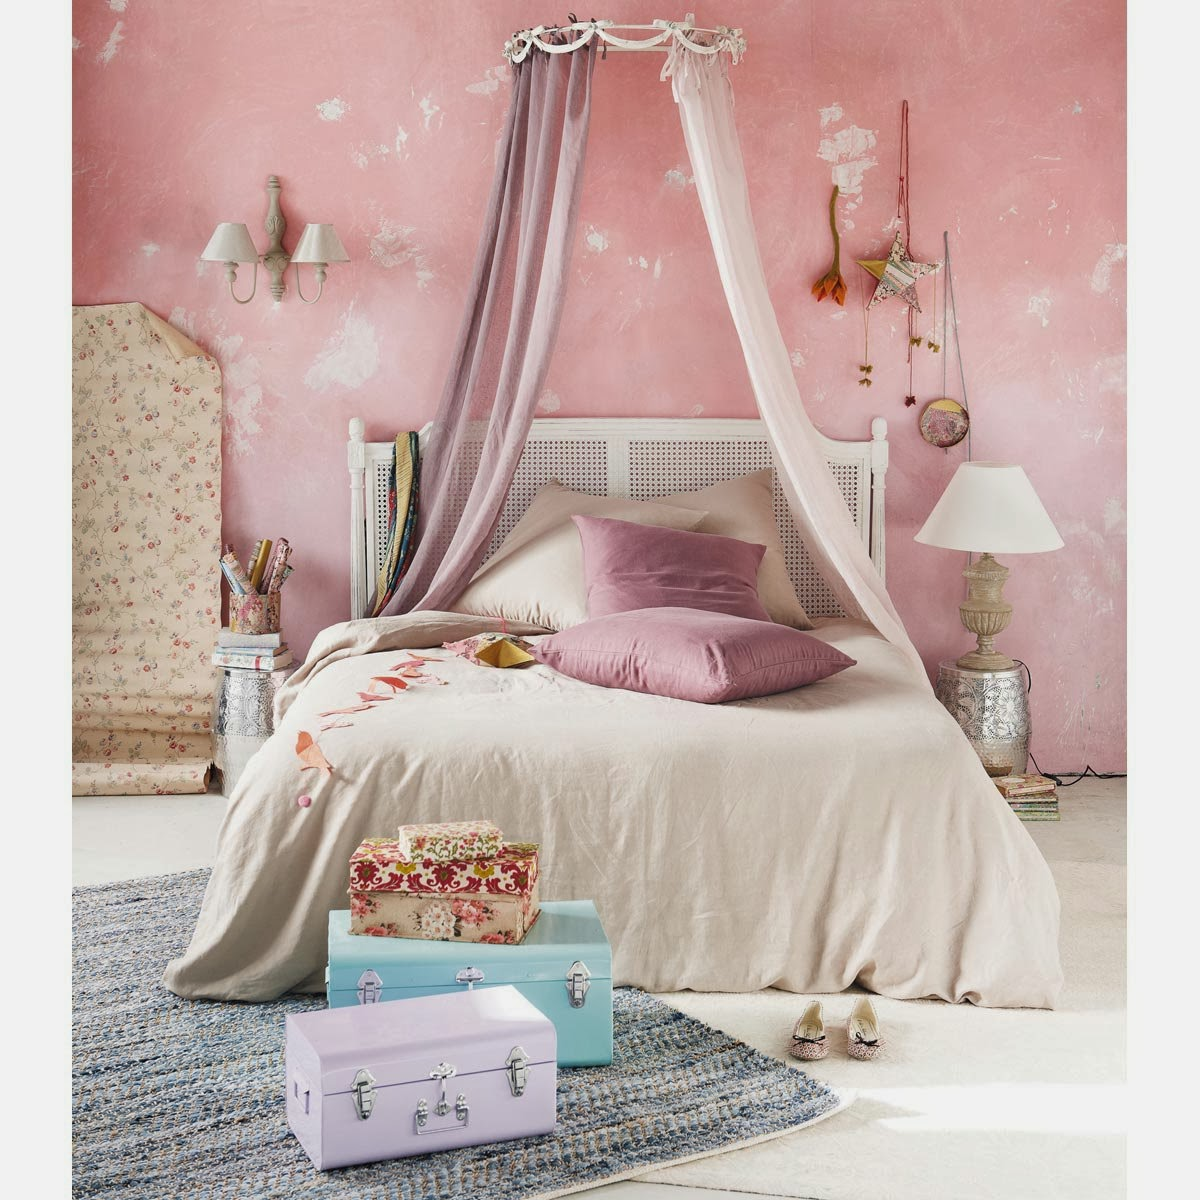 la parigi di maria antonietta un po di versailles a casa tua parte ii carta da parati stoffe. Black Bedroom Furniture Sets. Home Design Ideas